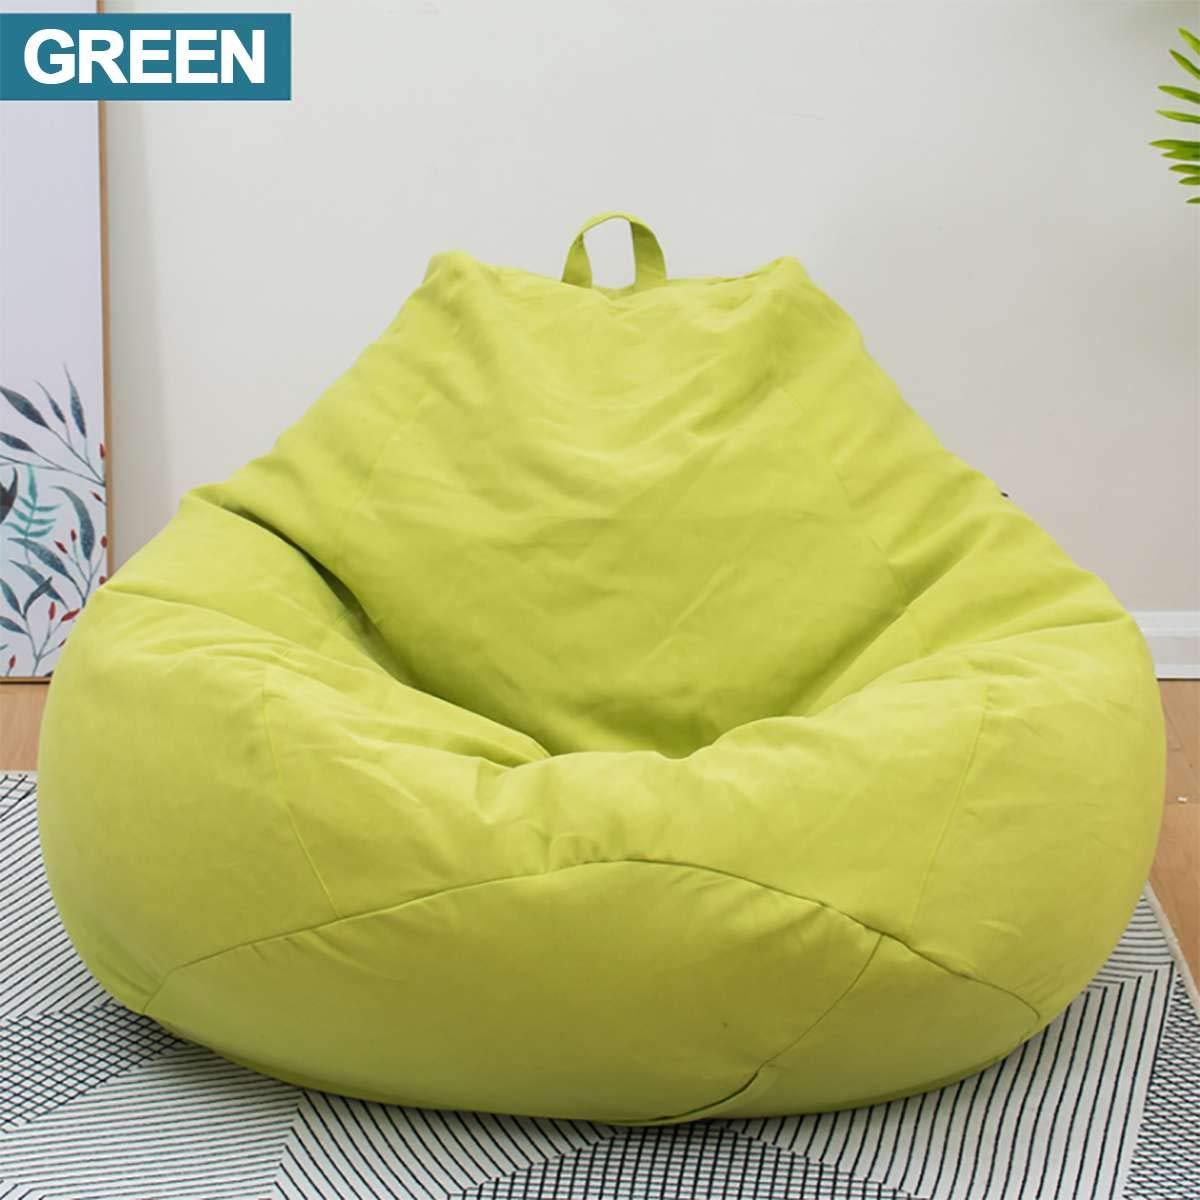 Remarkable Amazon Com Lazy Beanbag Sofas Cotton Linen Cloth Lounger Inzonedesignstudio Interior Chair Design Inzonedesignstudiocom